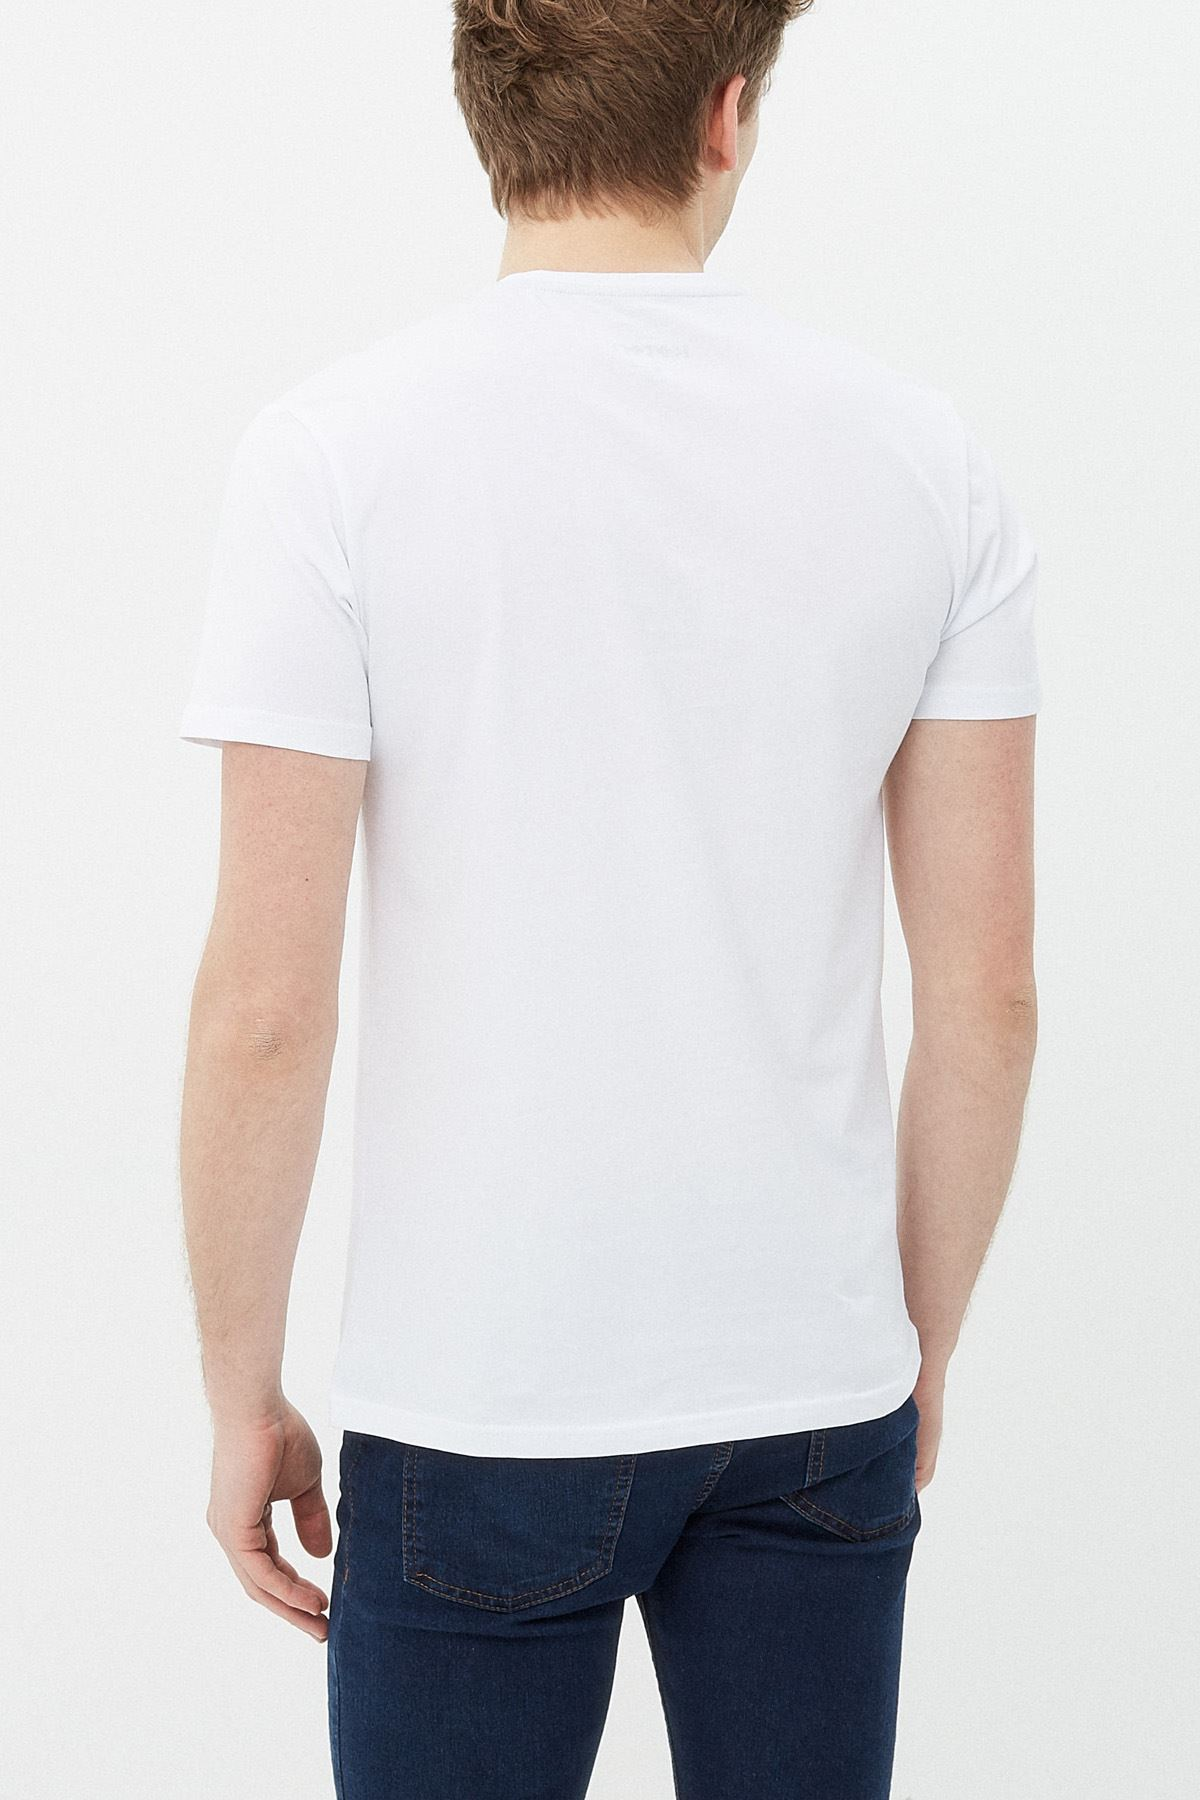 Naruto Anime 06 Beyaz Erkek Tshirt - Tişört